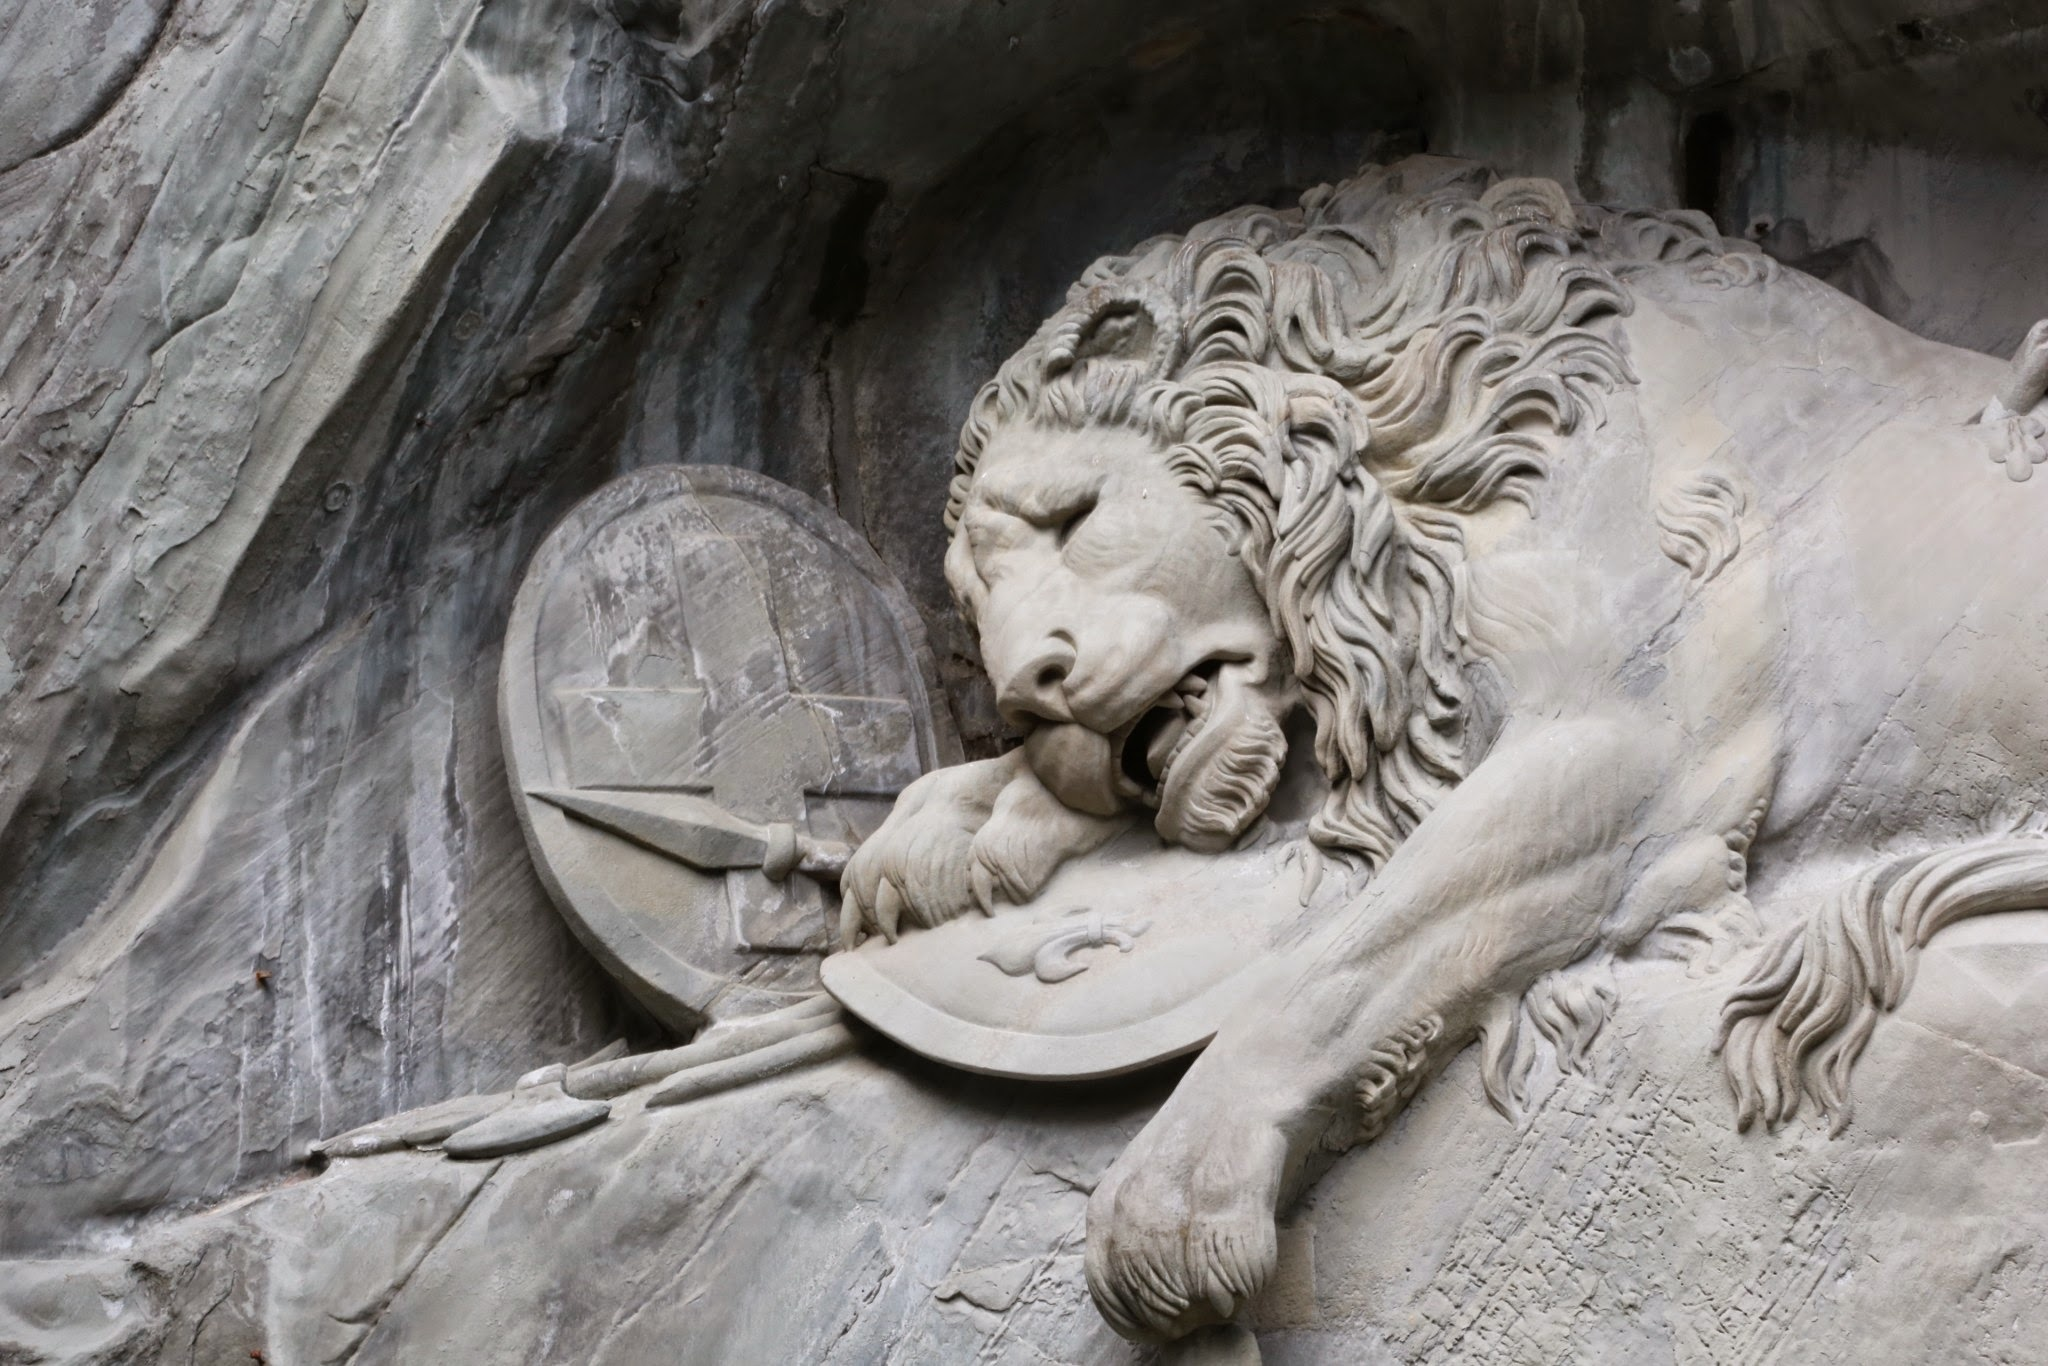 Lion Monument, Lucerne by zenilk